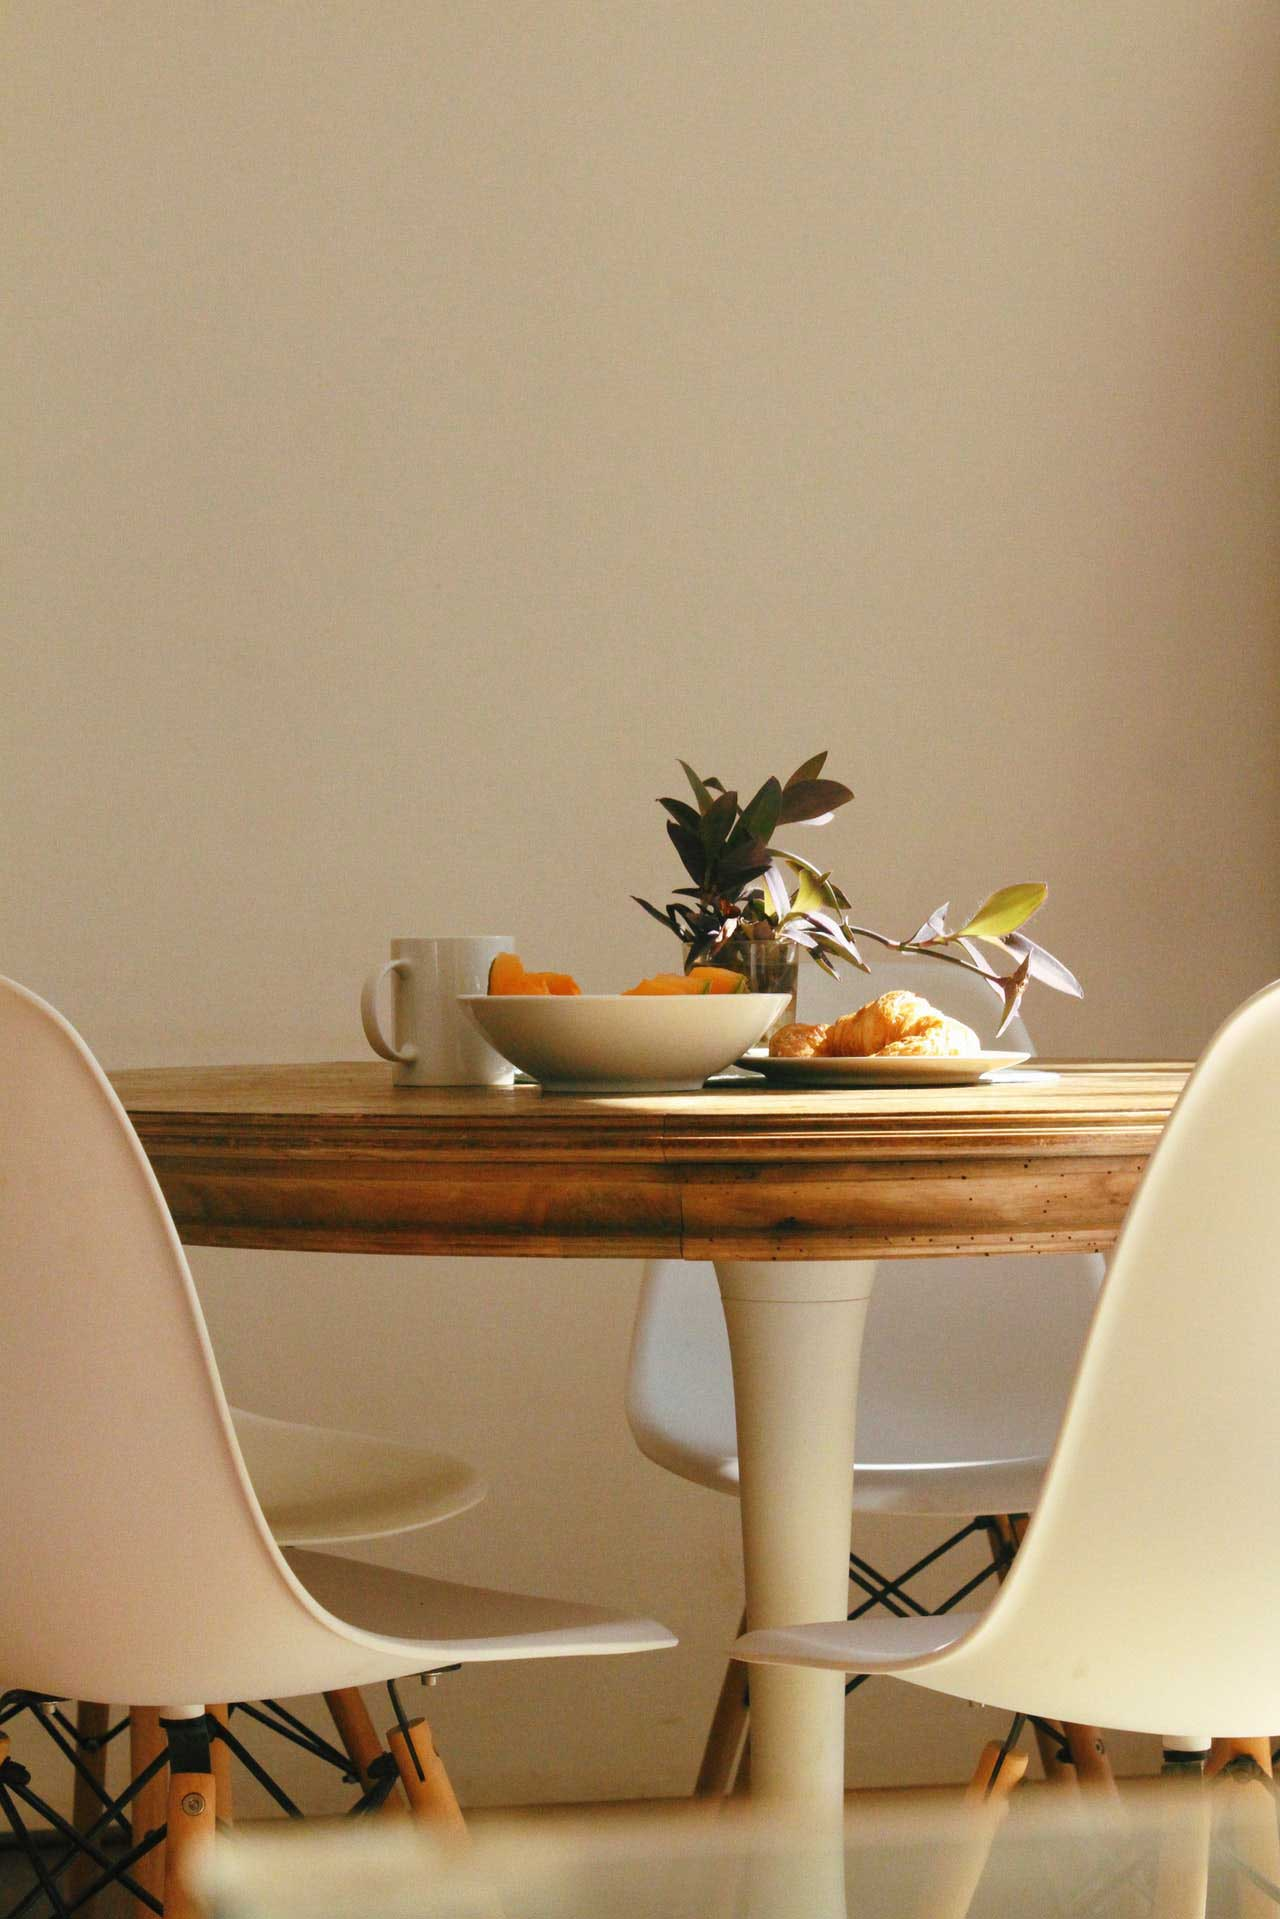 5 Muebles de comedor imprescindibles